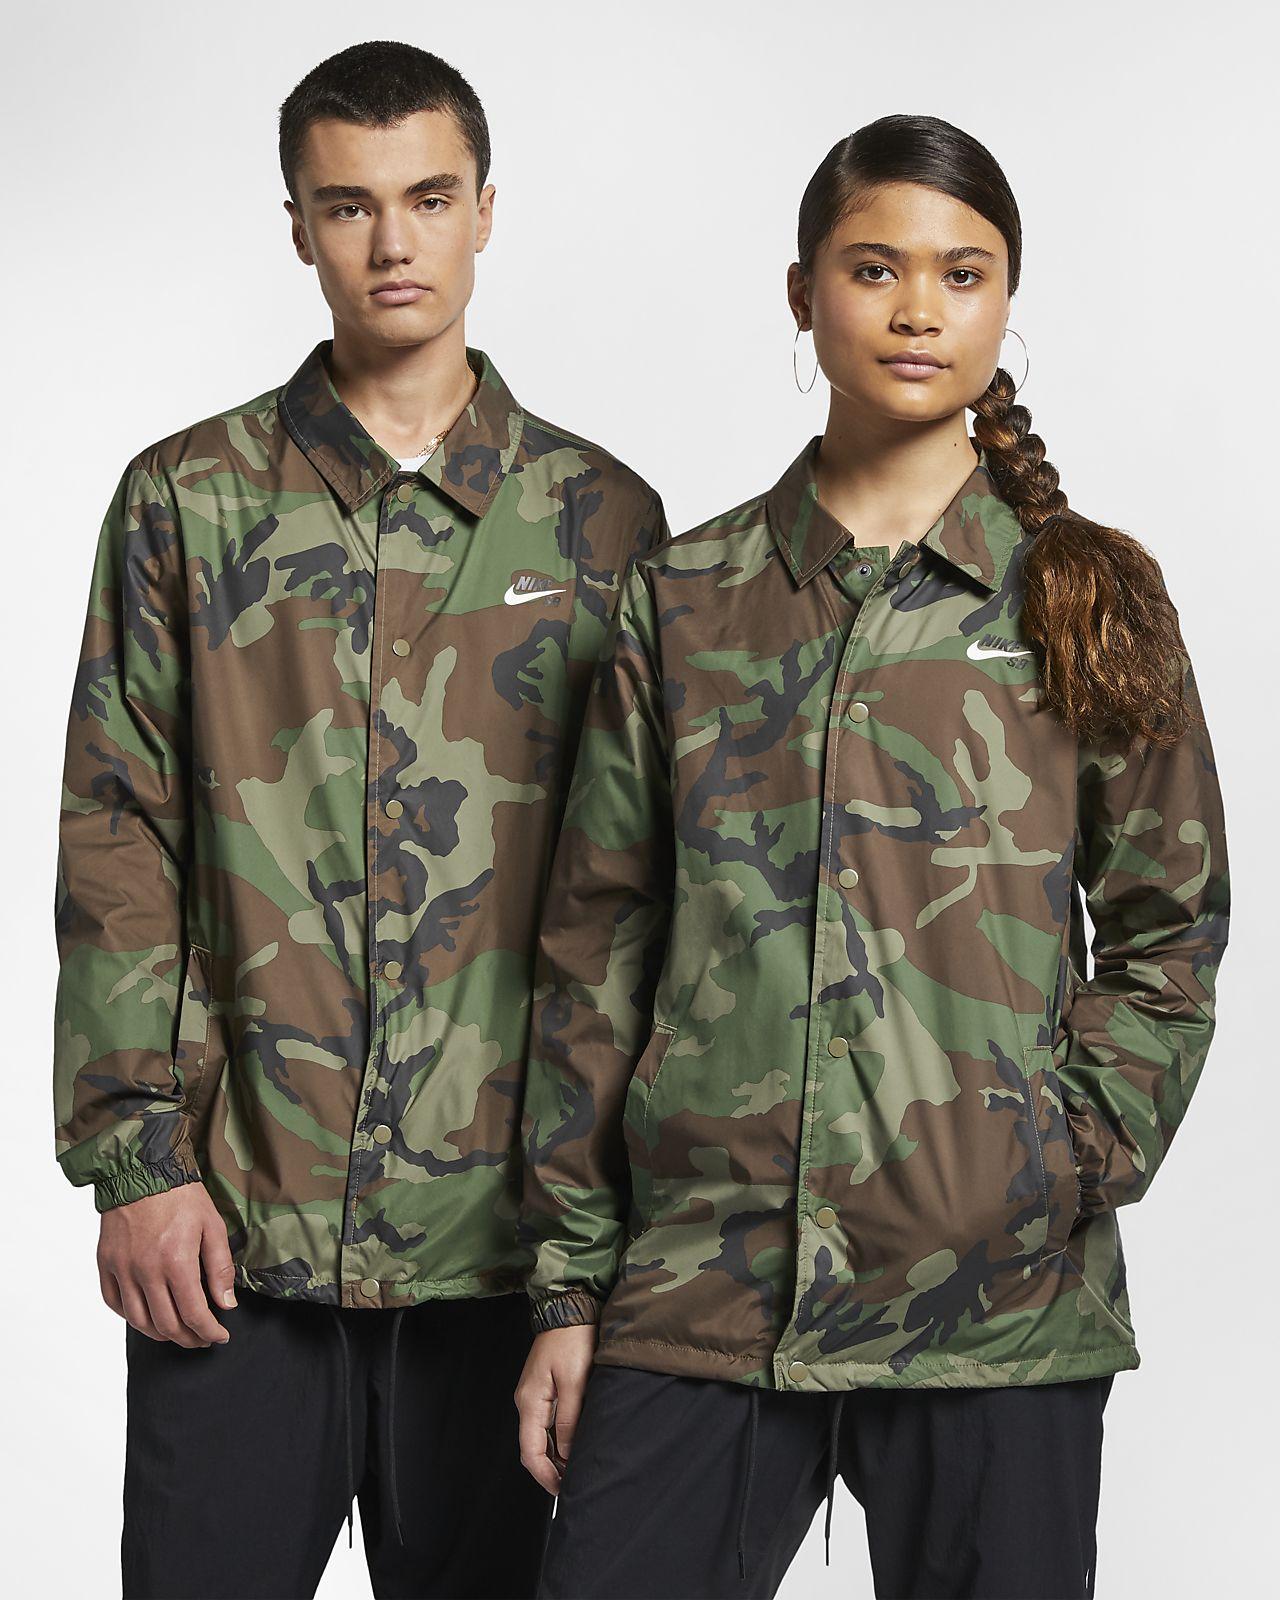 Куртка с камуфляжем для скейтбординга Nike SB